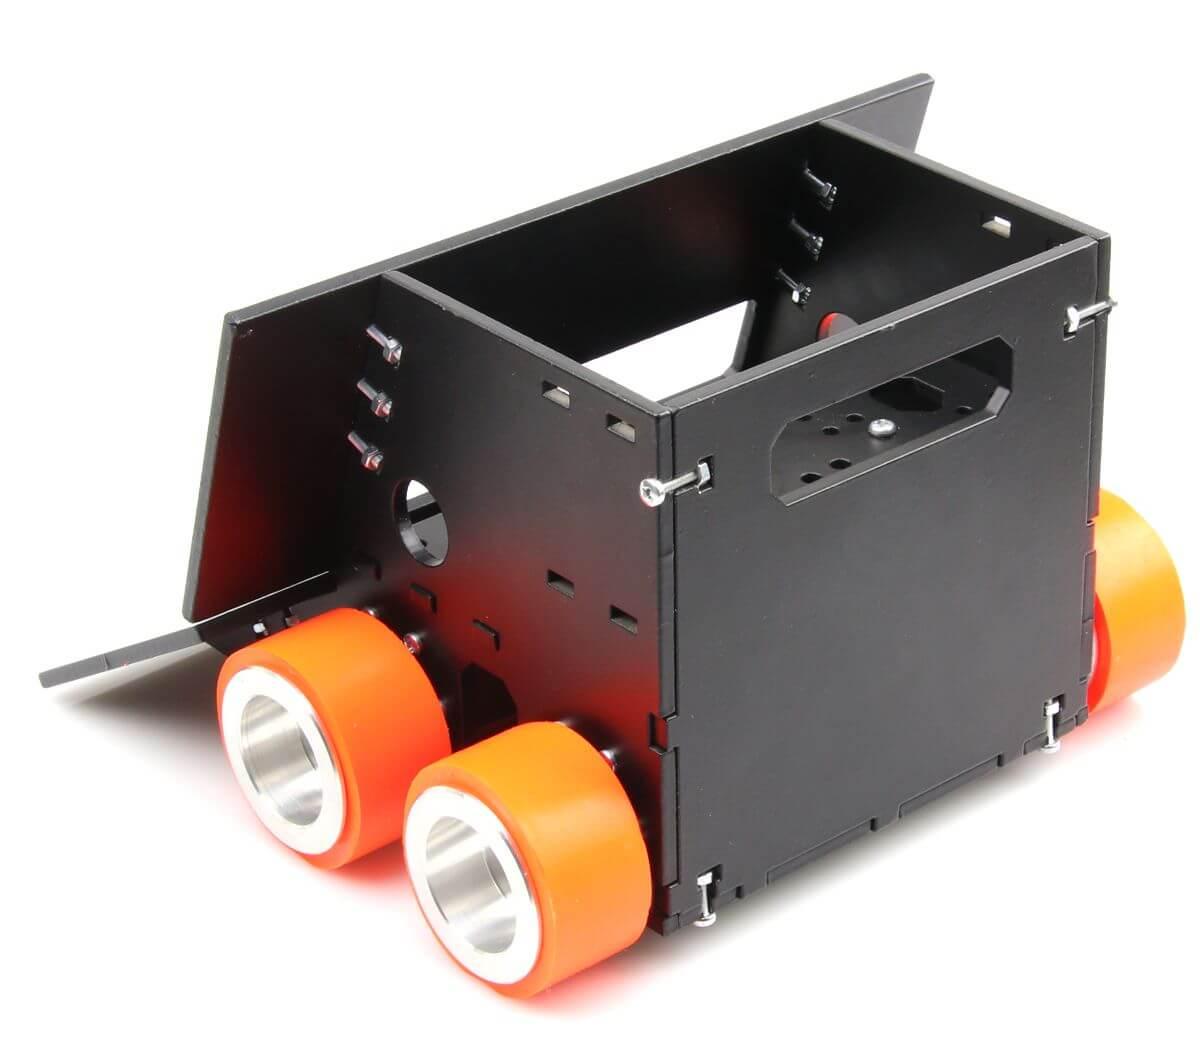 Titan 4x4 Sumo Robot Kit (Mechanical Kit No Electronics)